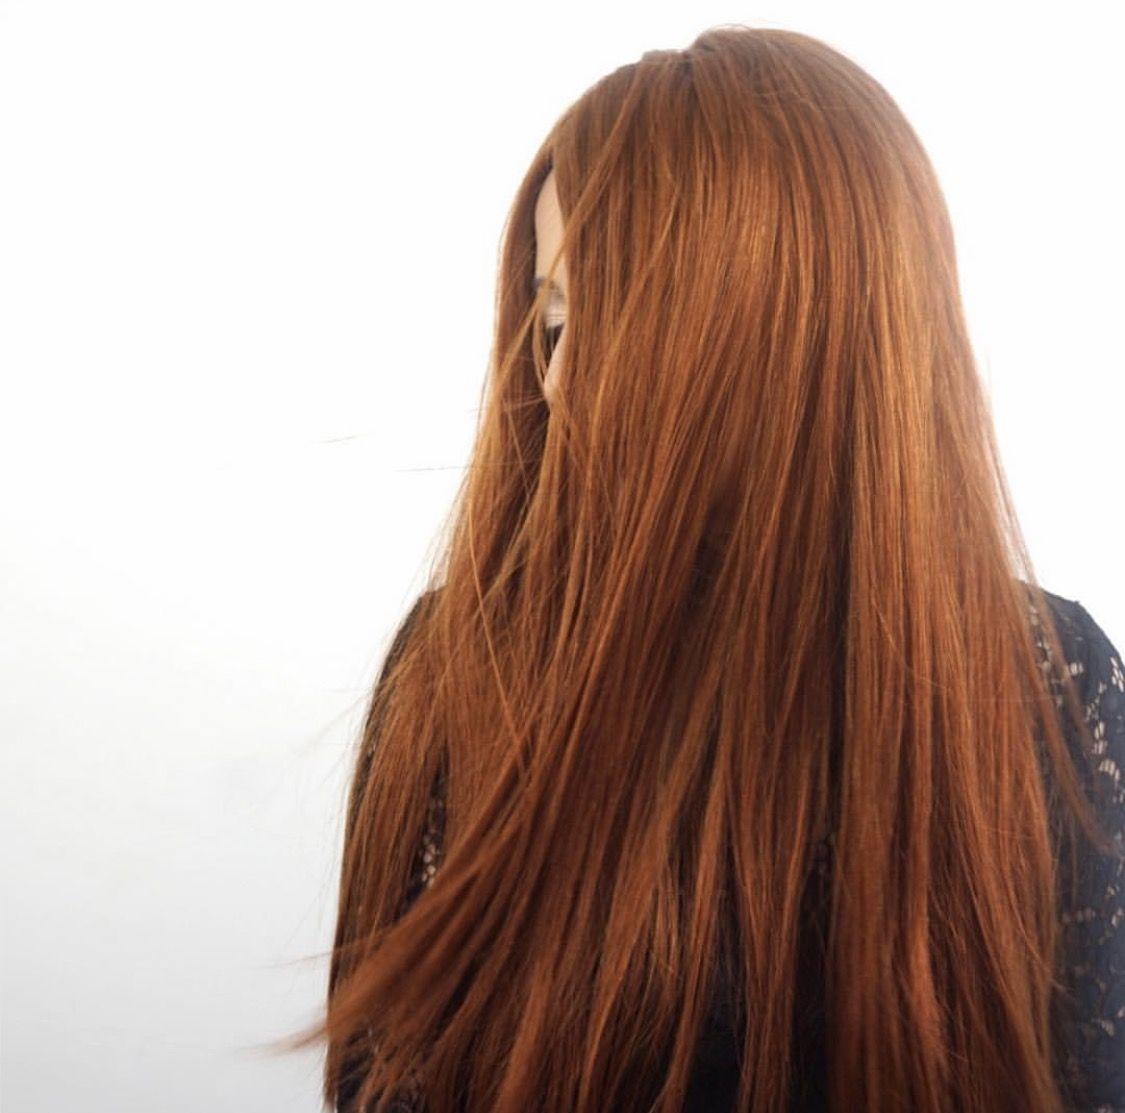 Our newest shade vibrant auburn tressmirage hair extensions hair